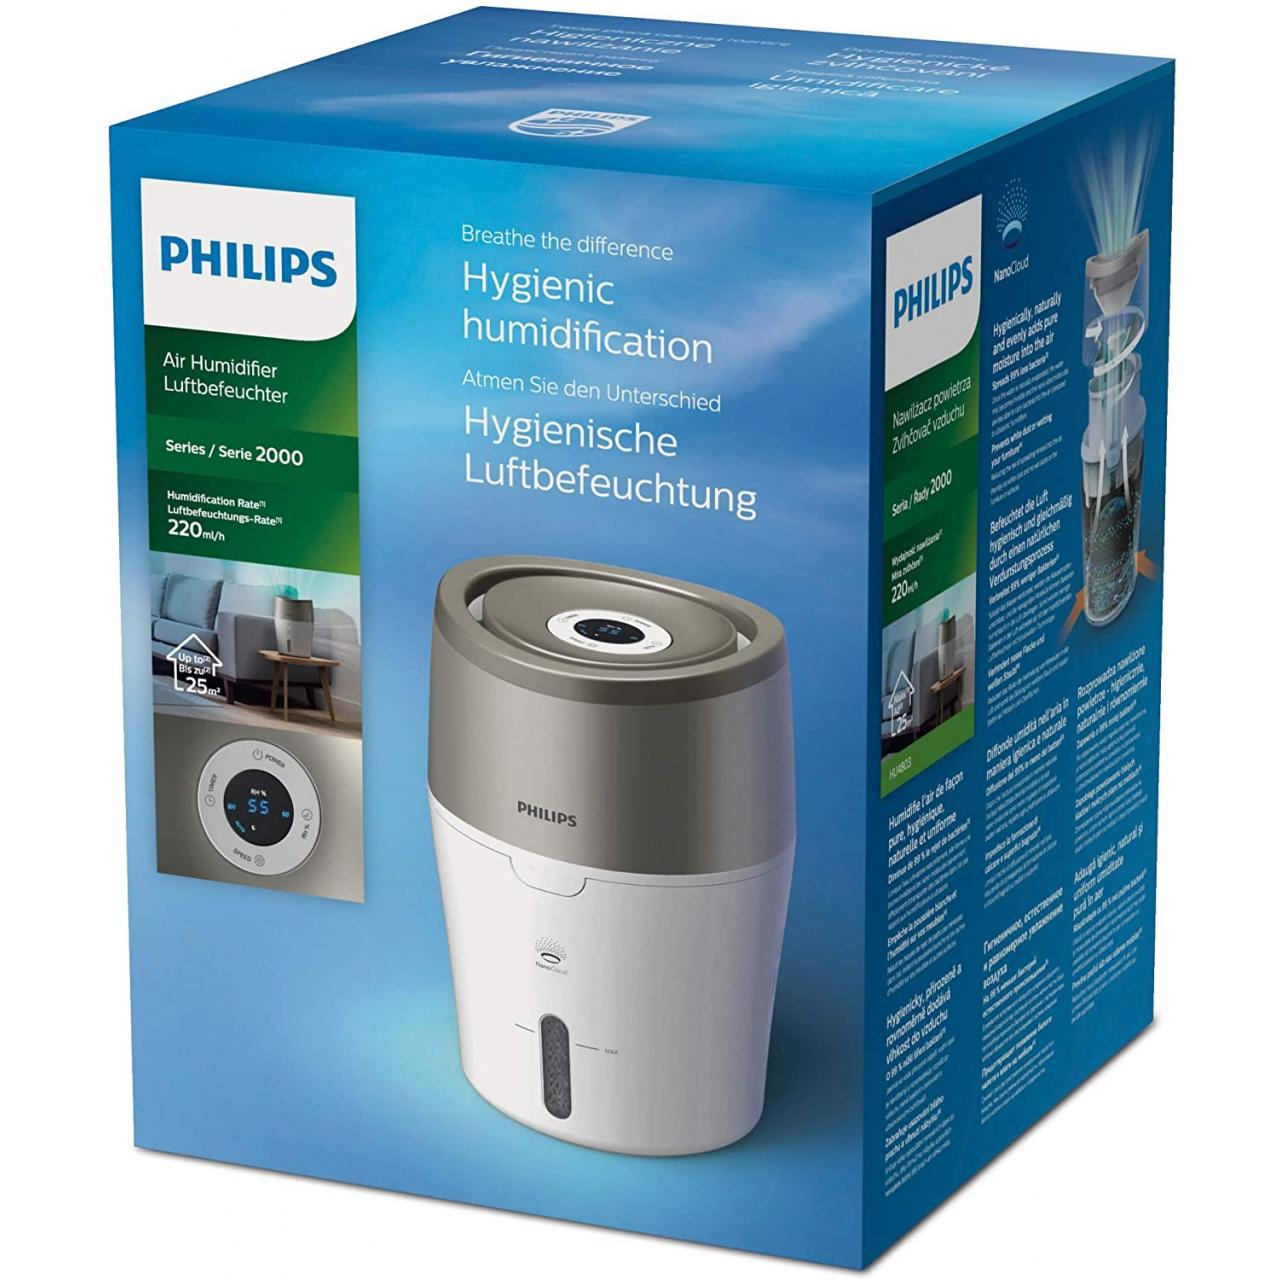 Umidificator aer Philips HU4803/01, Tehnologie Nanocloud, Rezervor 2L, Alb/Gri